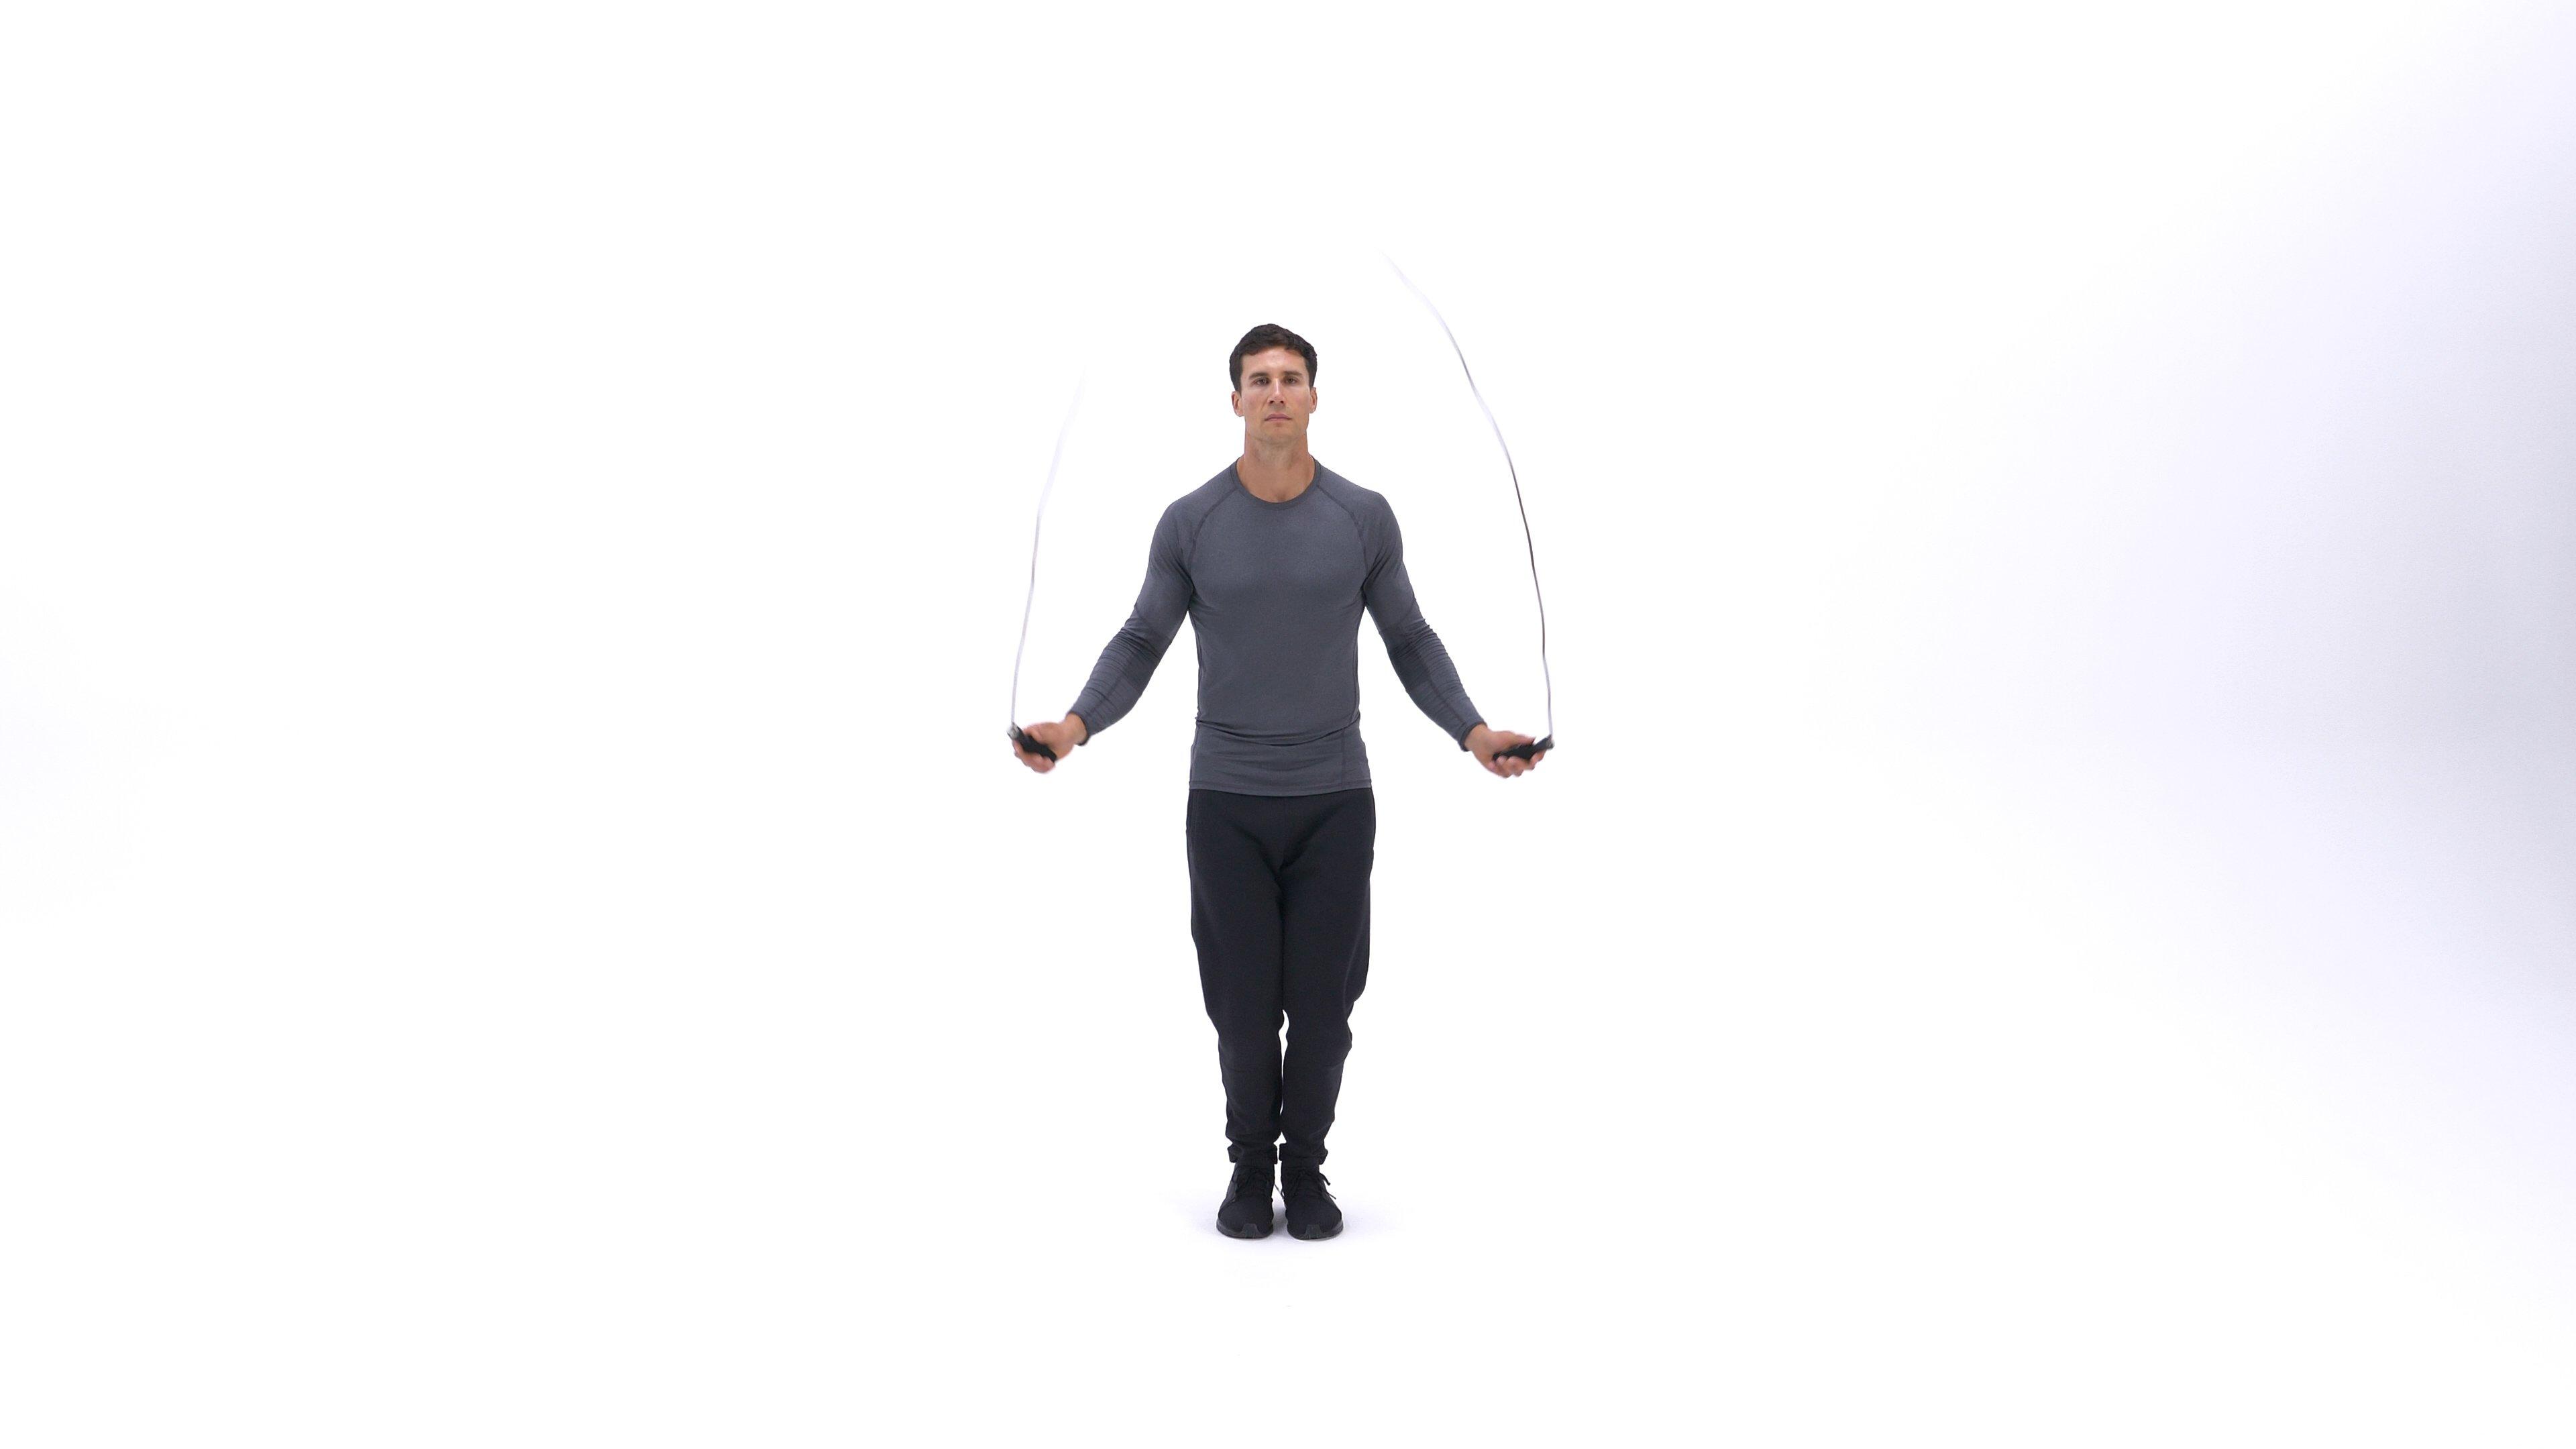 Rope Jumping image